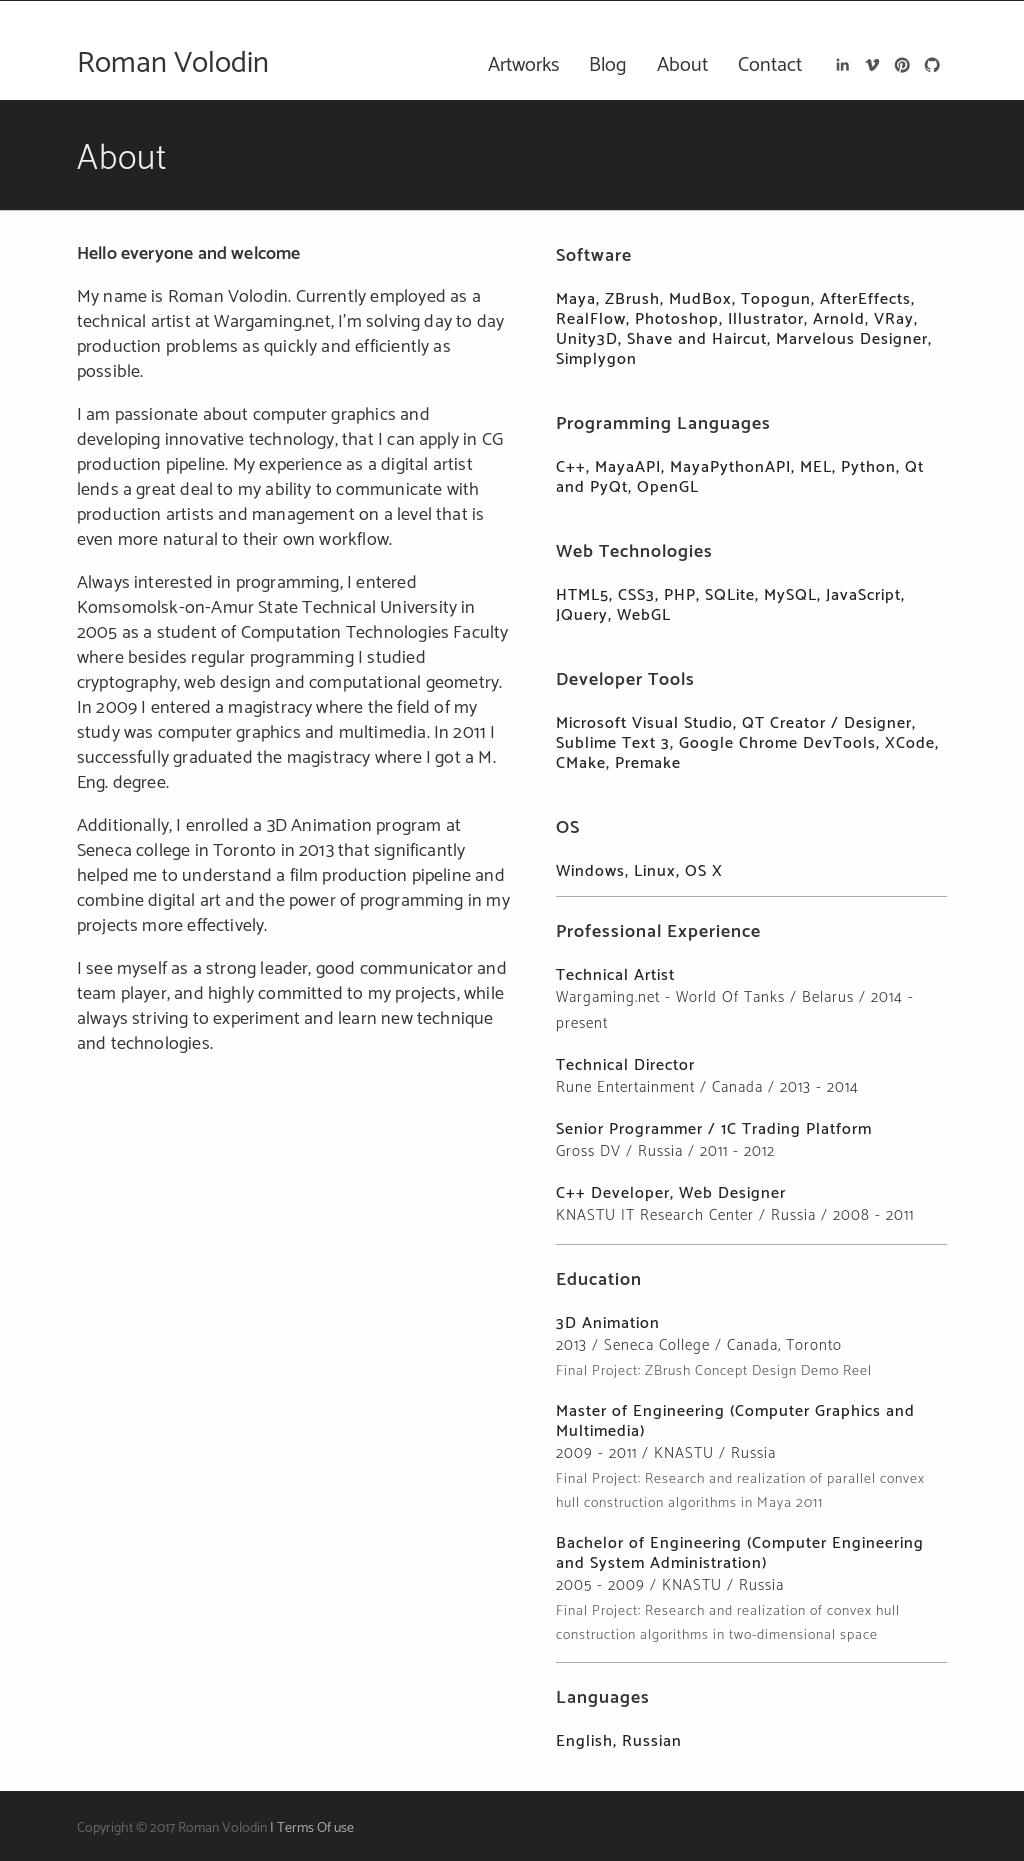 Roman Volodin Competitors, Revenue and Employees - Owler Company Profile